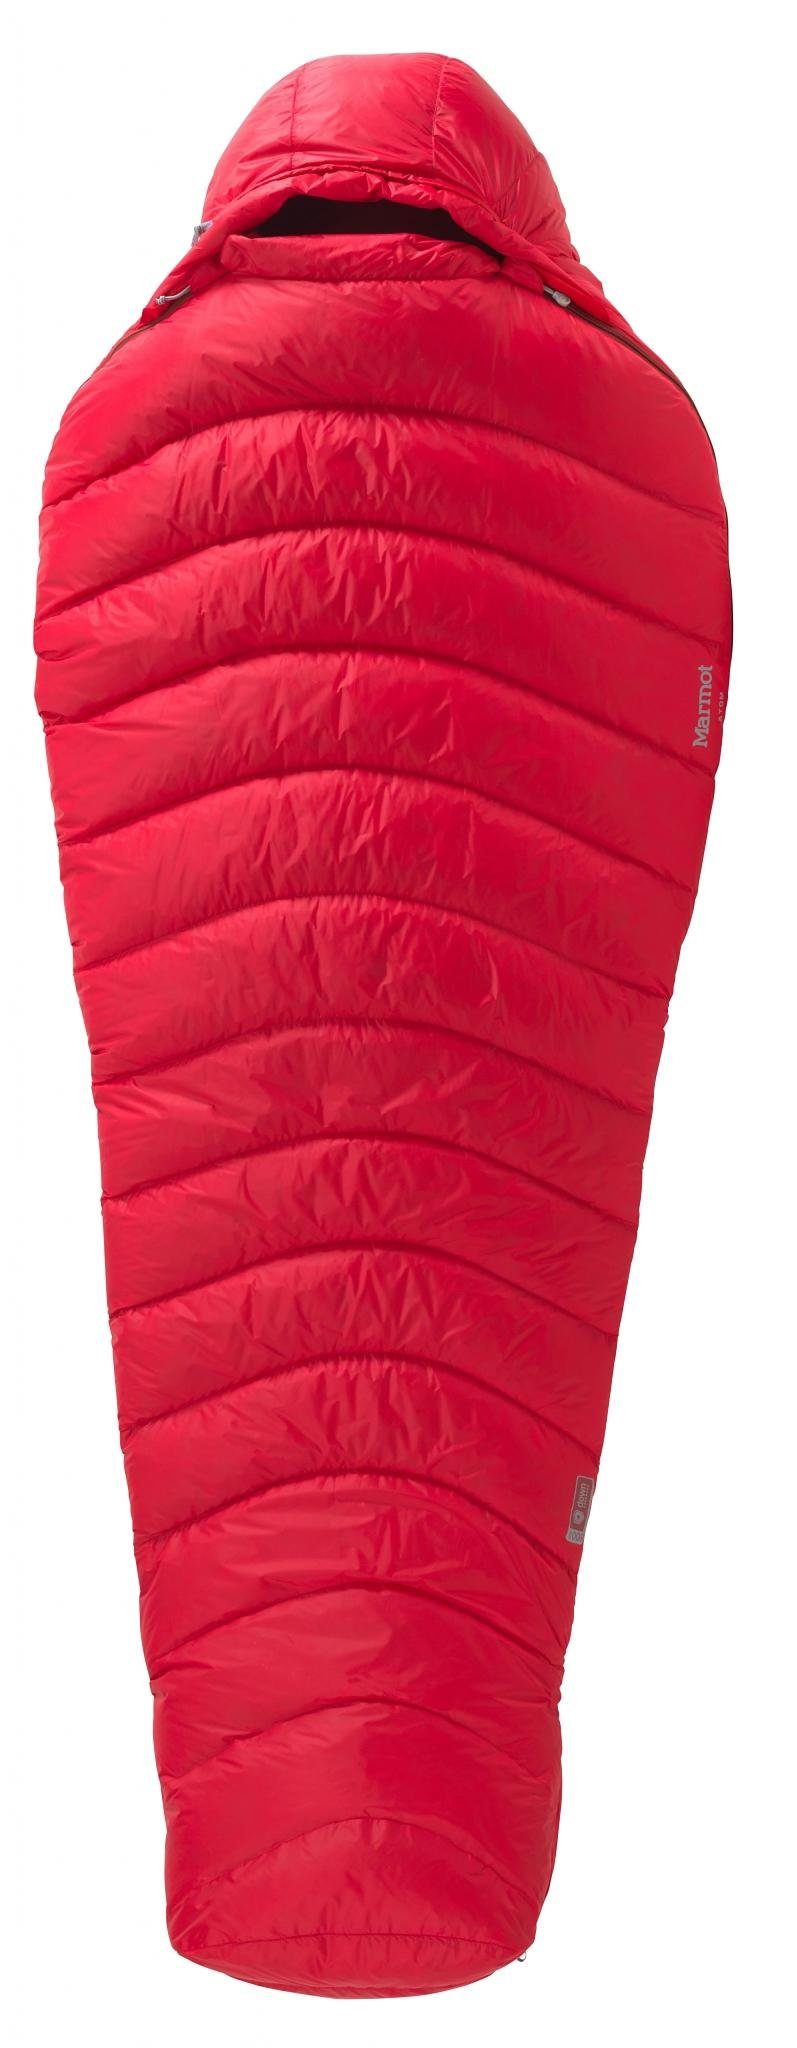 Marmot Wanderrucksack »Atom Sleeping Bag Long«